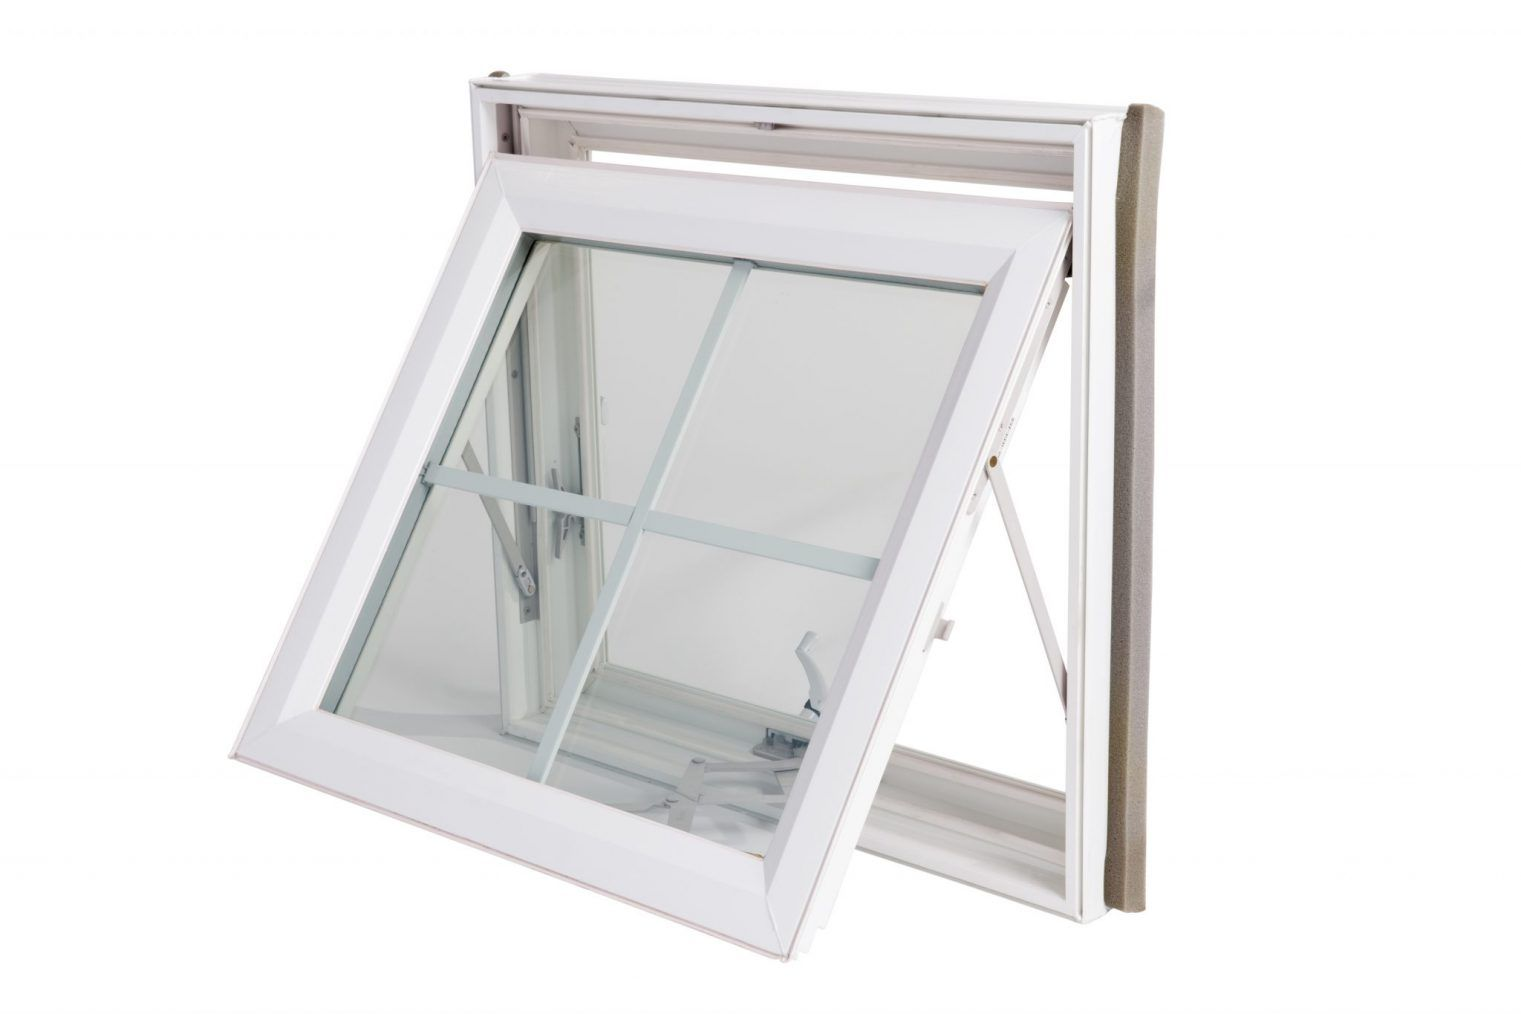 Awning Windows And Hopper Windows Window Awnings Awning Windows Kitchen Awning Windows